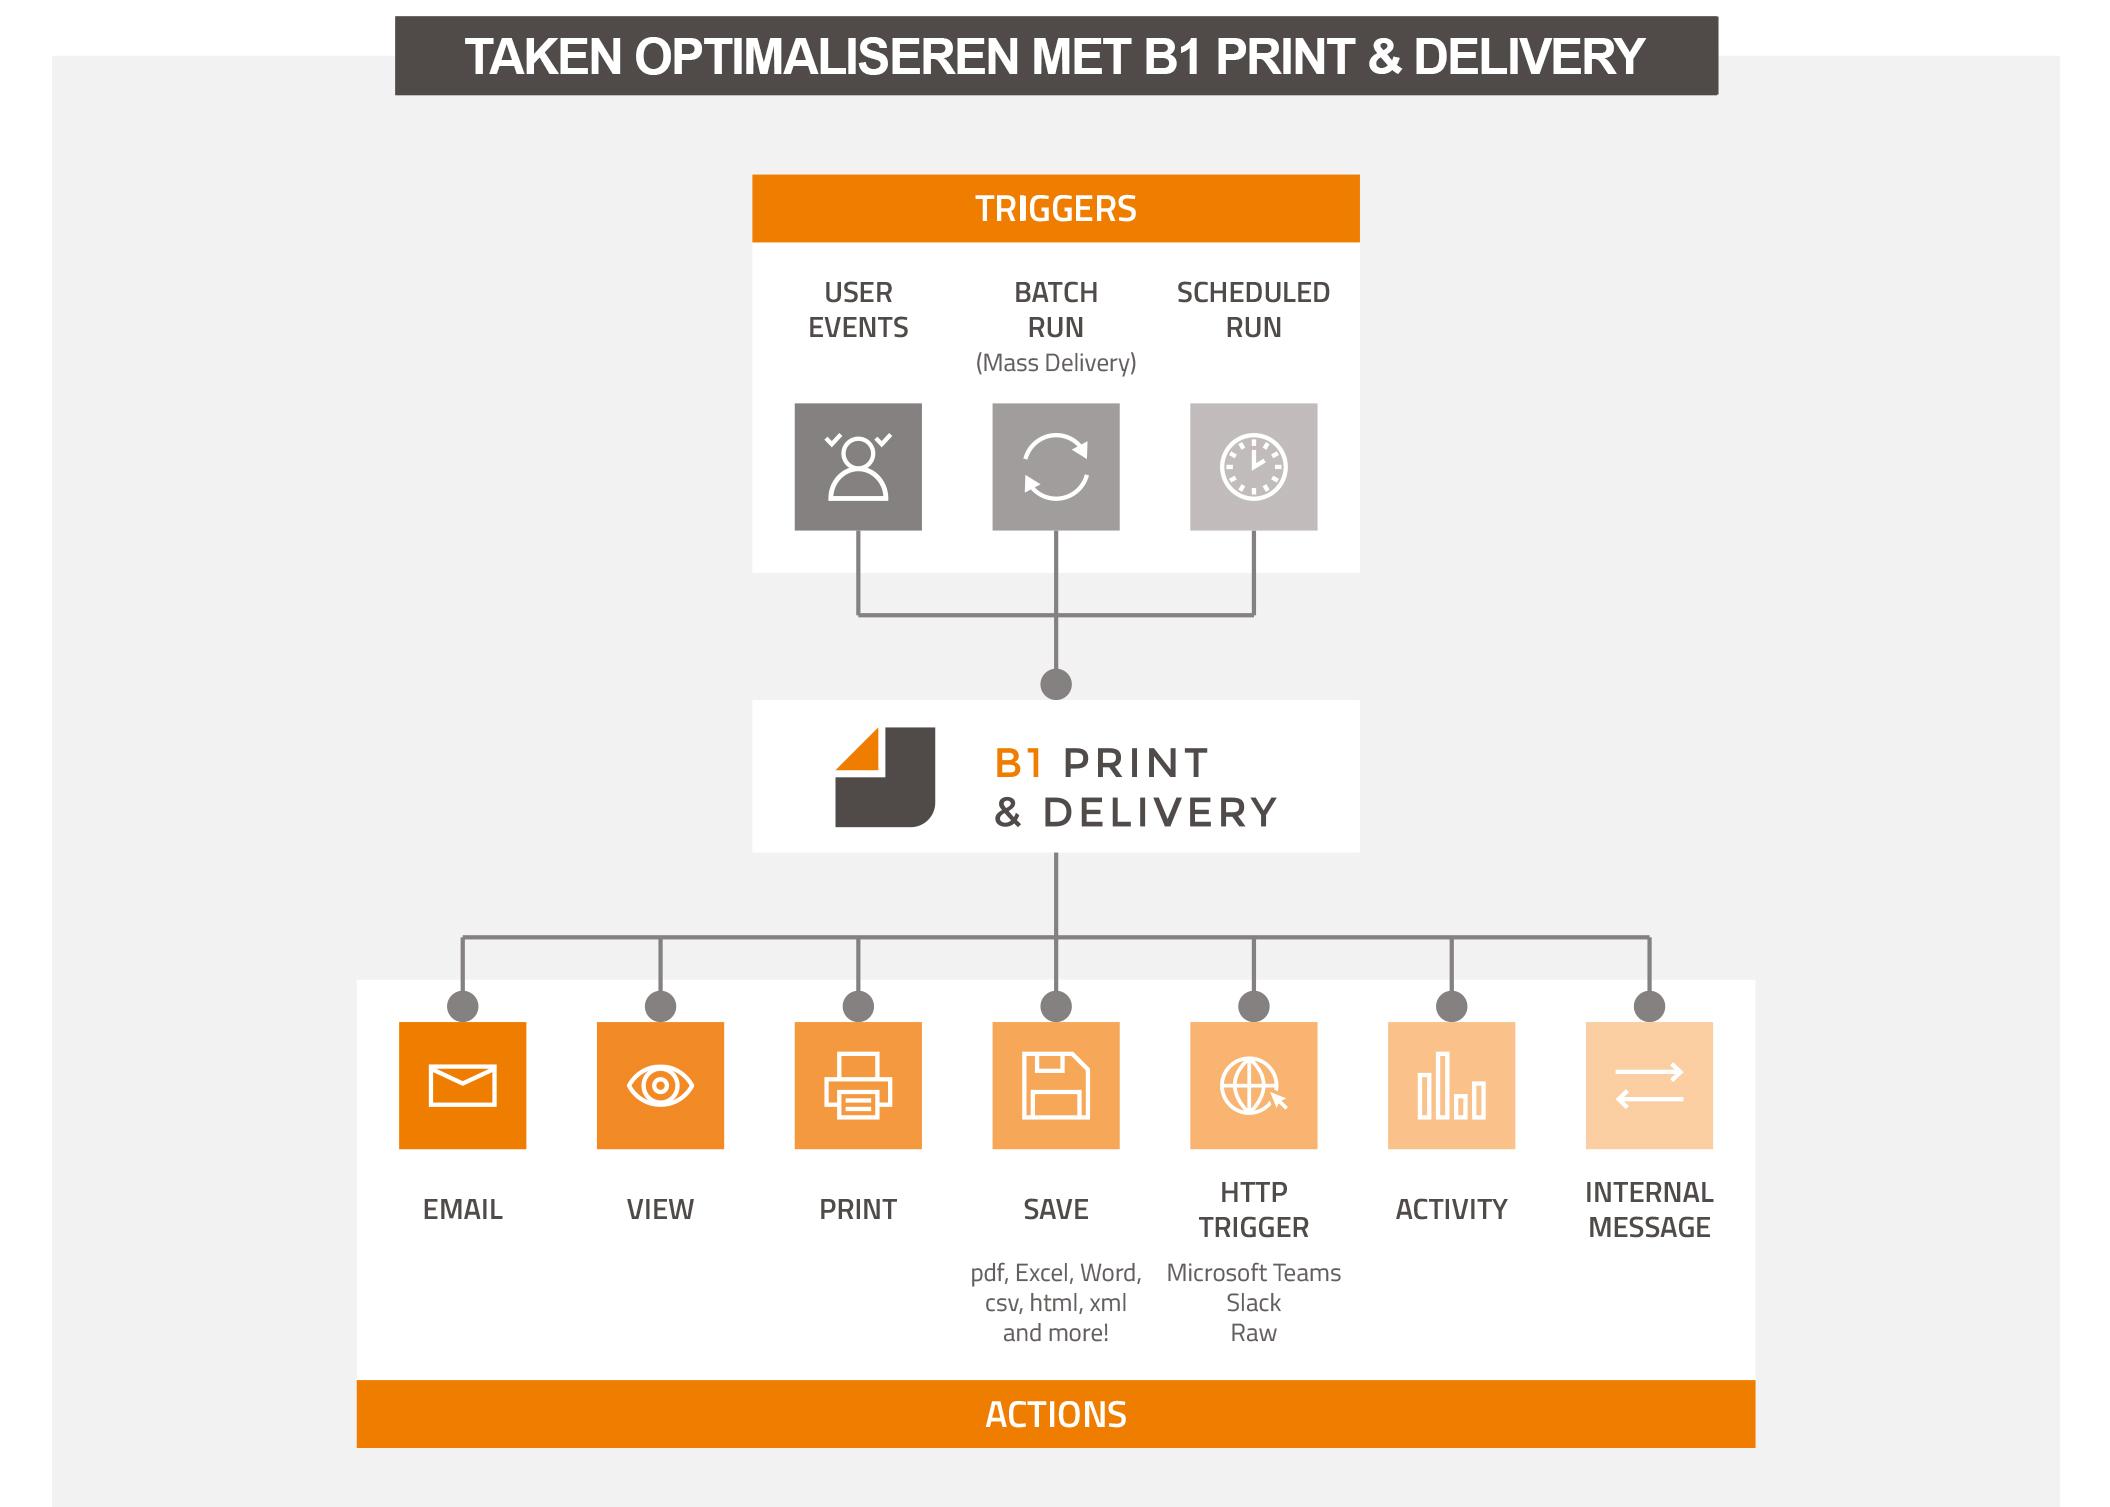 Taken-binnen-SAP-Business-One-optimaliseren-met-B1-Print-&-Delivery